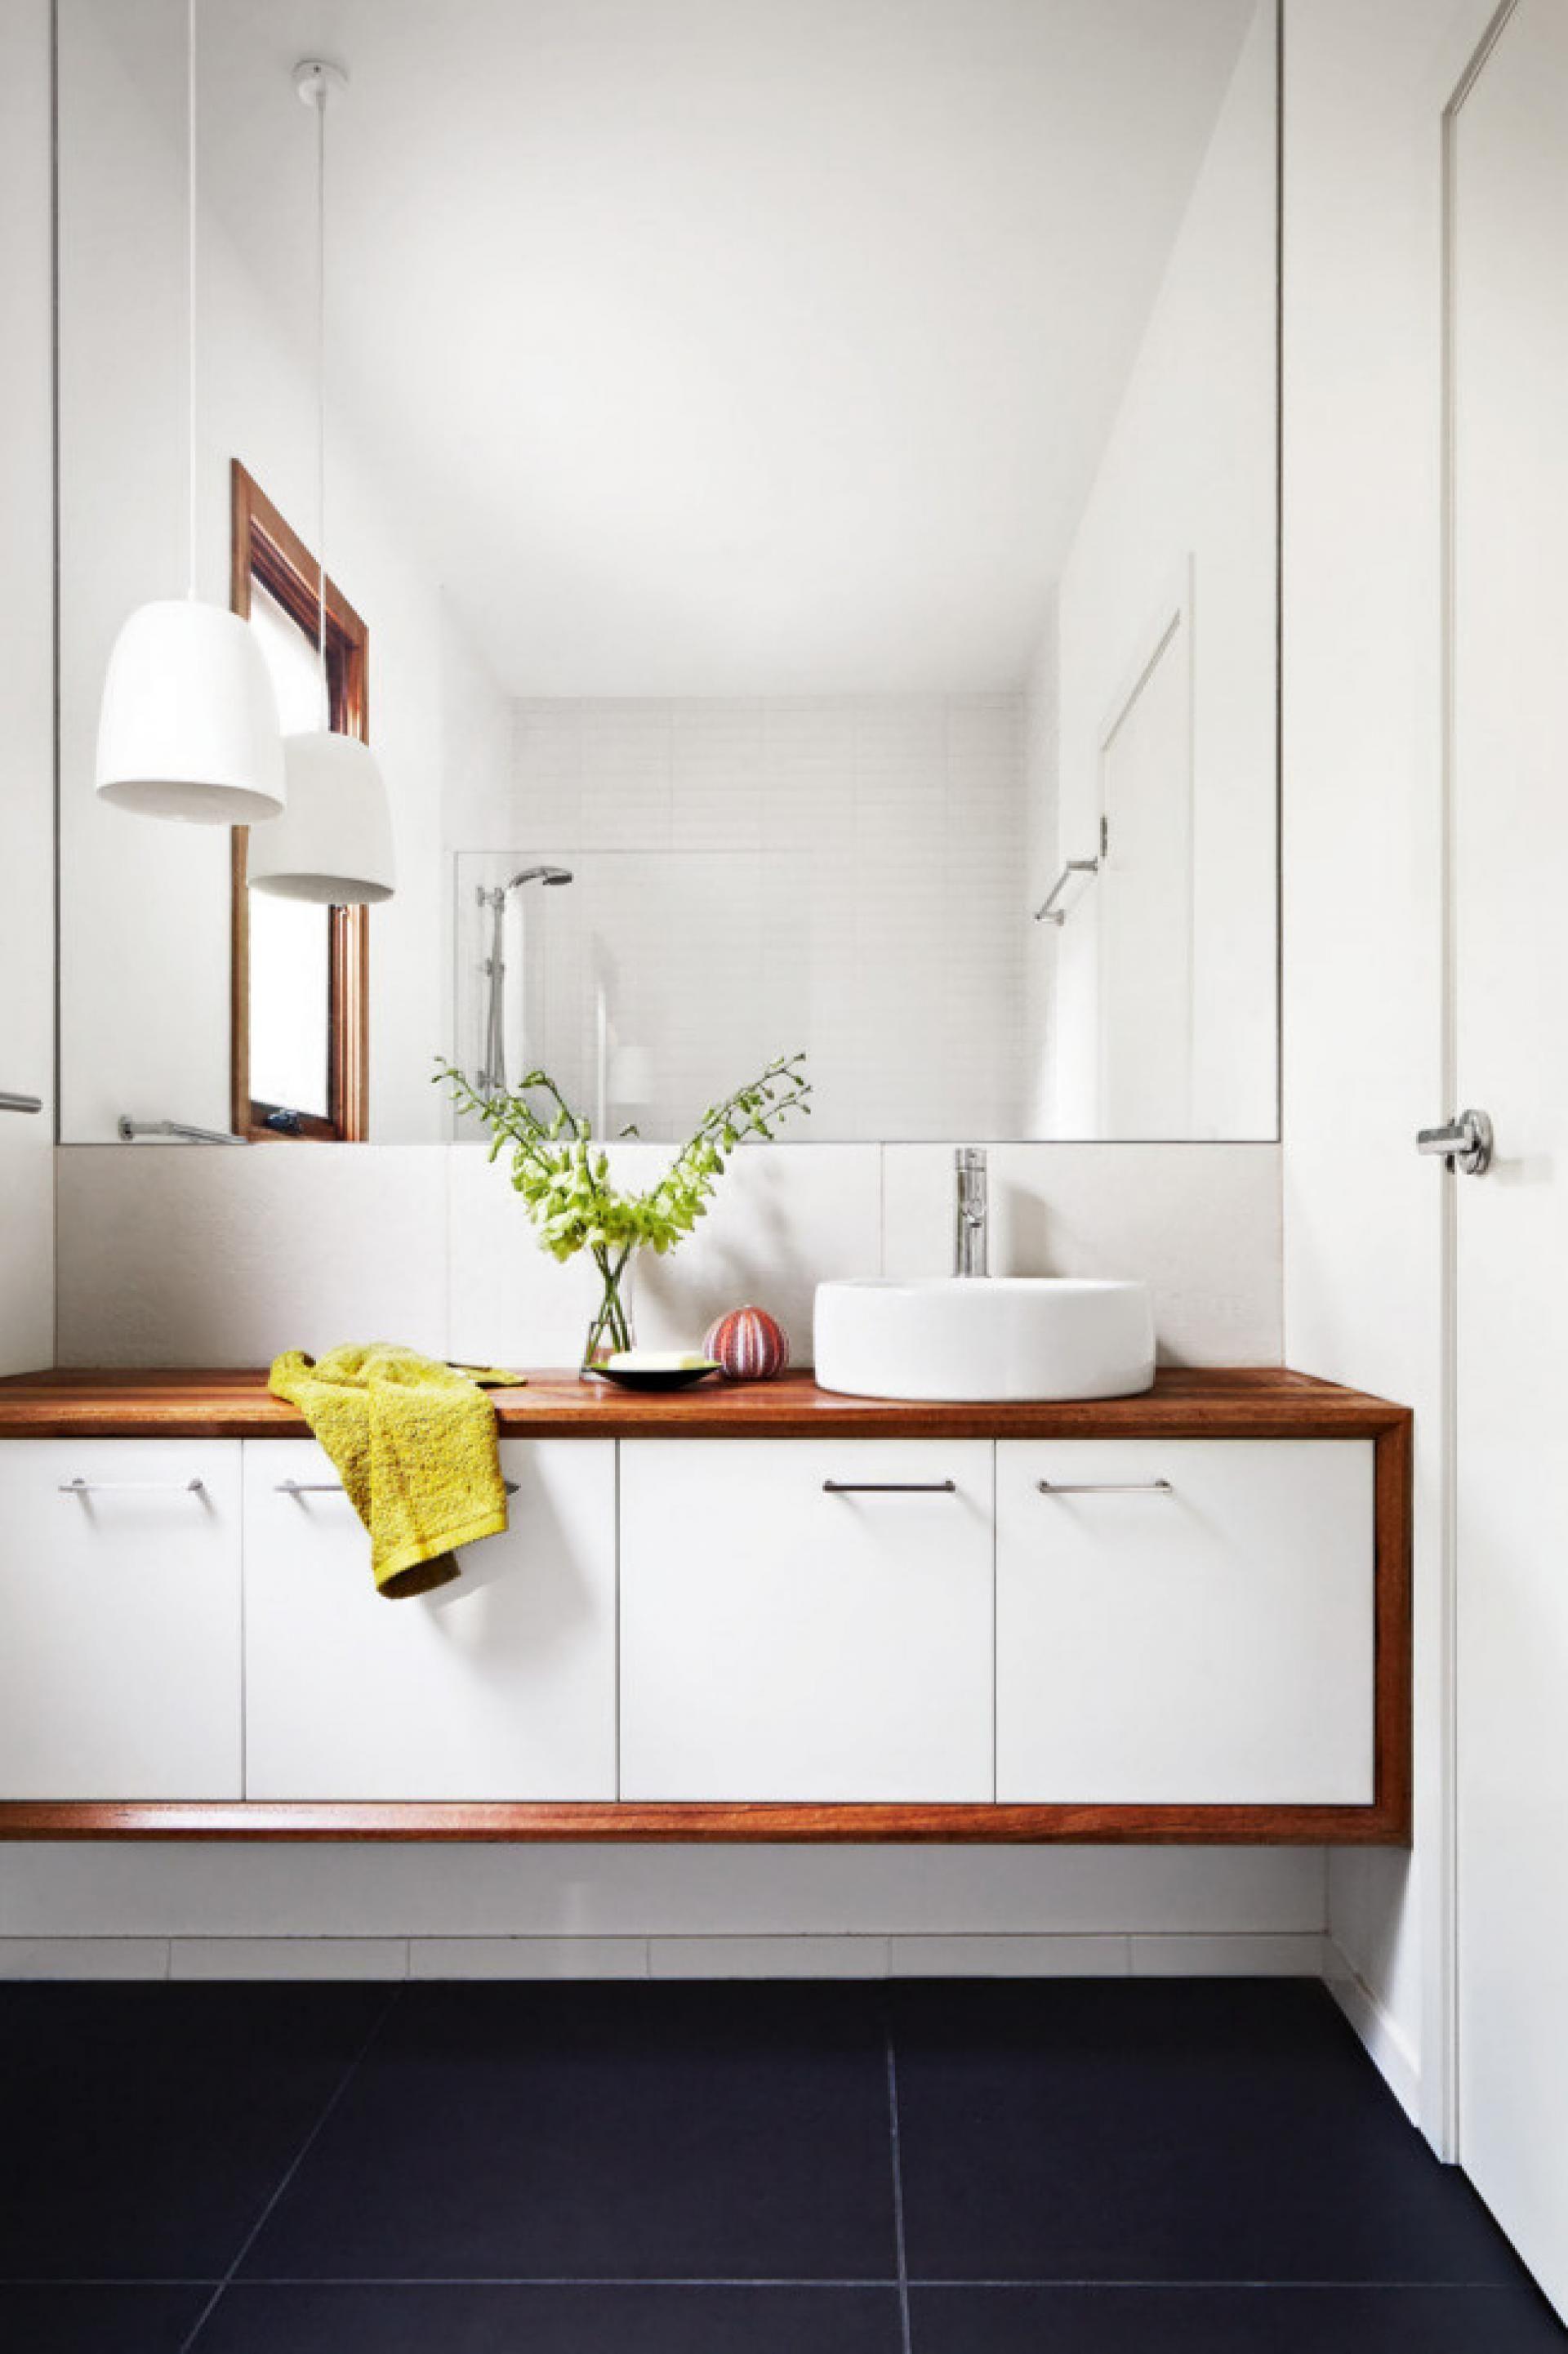 Badezimmer Akzent Mobel Badezimmer Innenausstattung Bad Inspiration